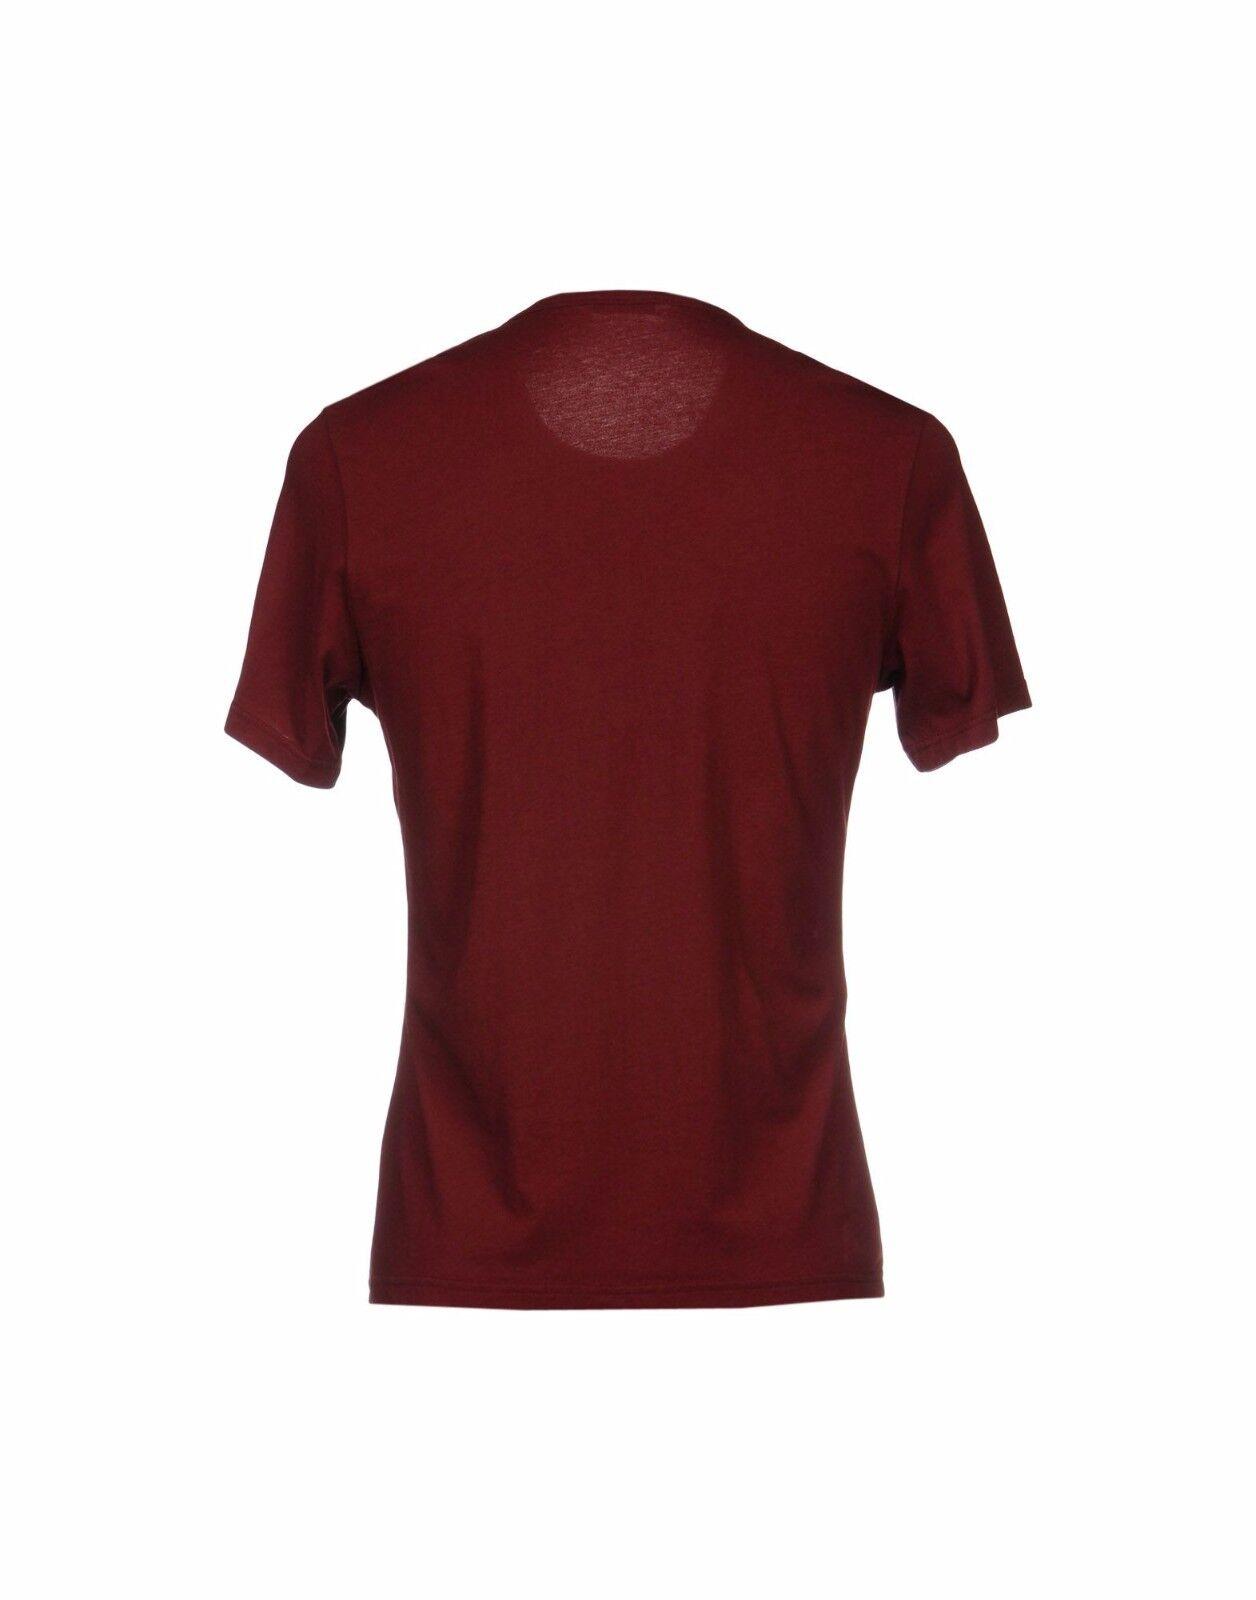 T-Shirt KENZO PARIS TG.S  -70% SALE SALE SALE  Maglia Felpa DROP maglietta 100% ORIGINAL 5eed67